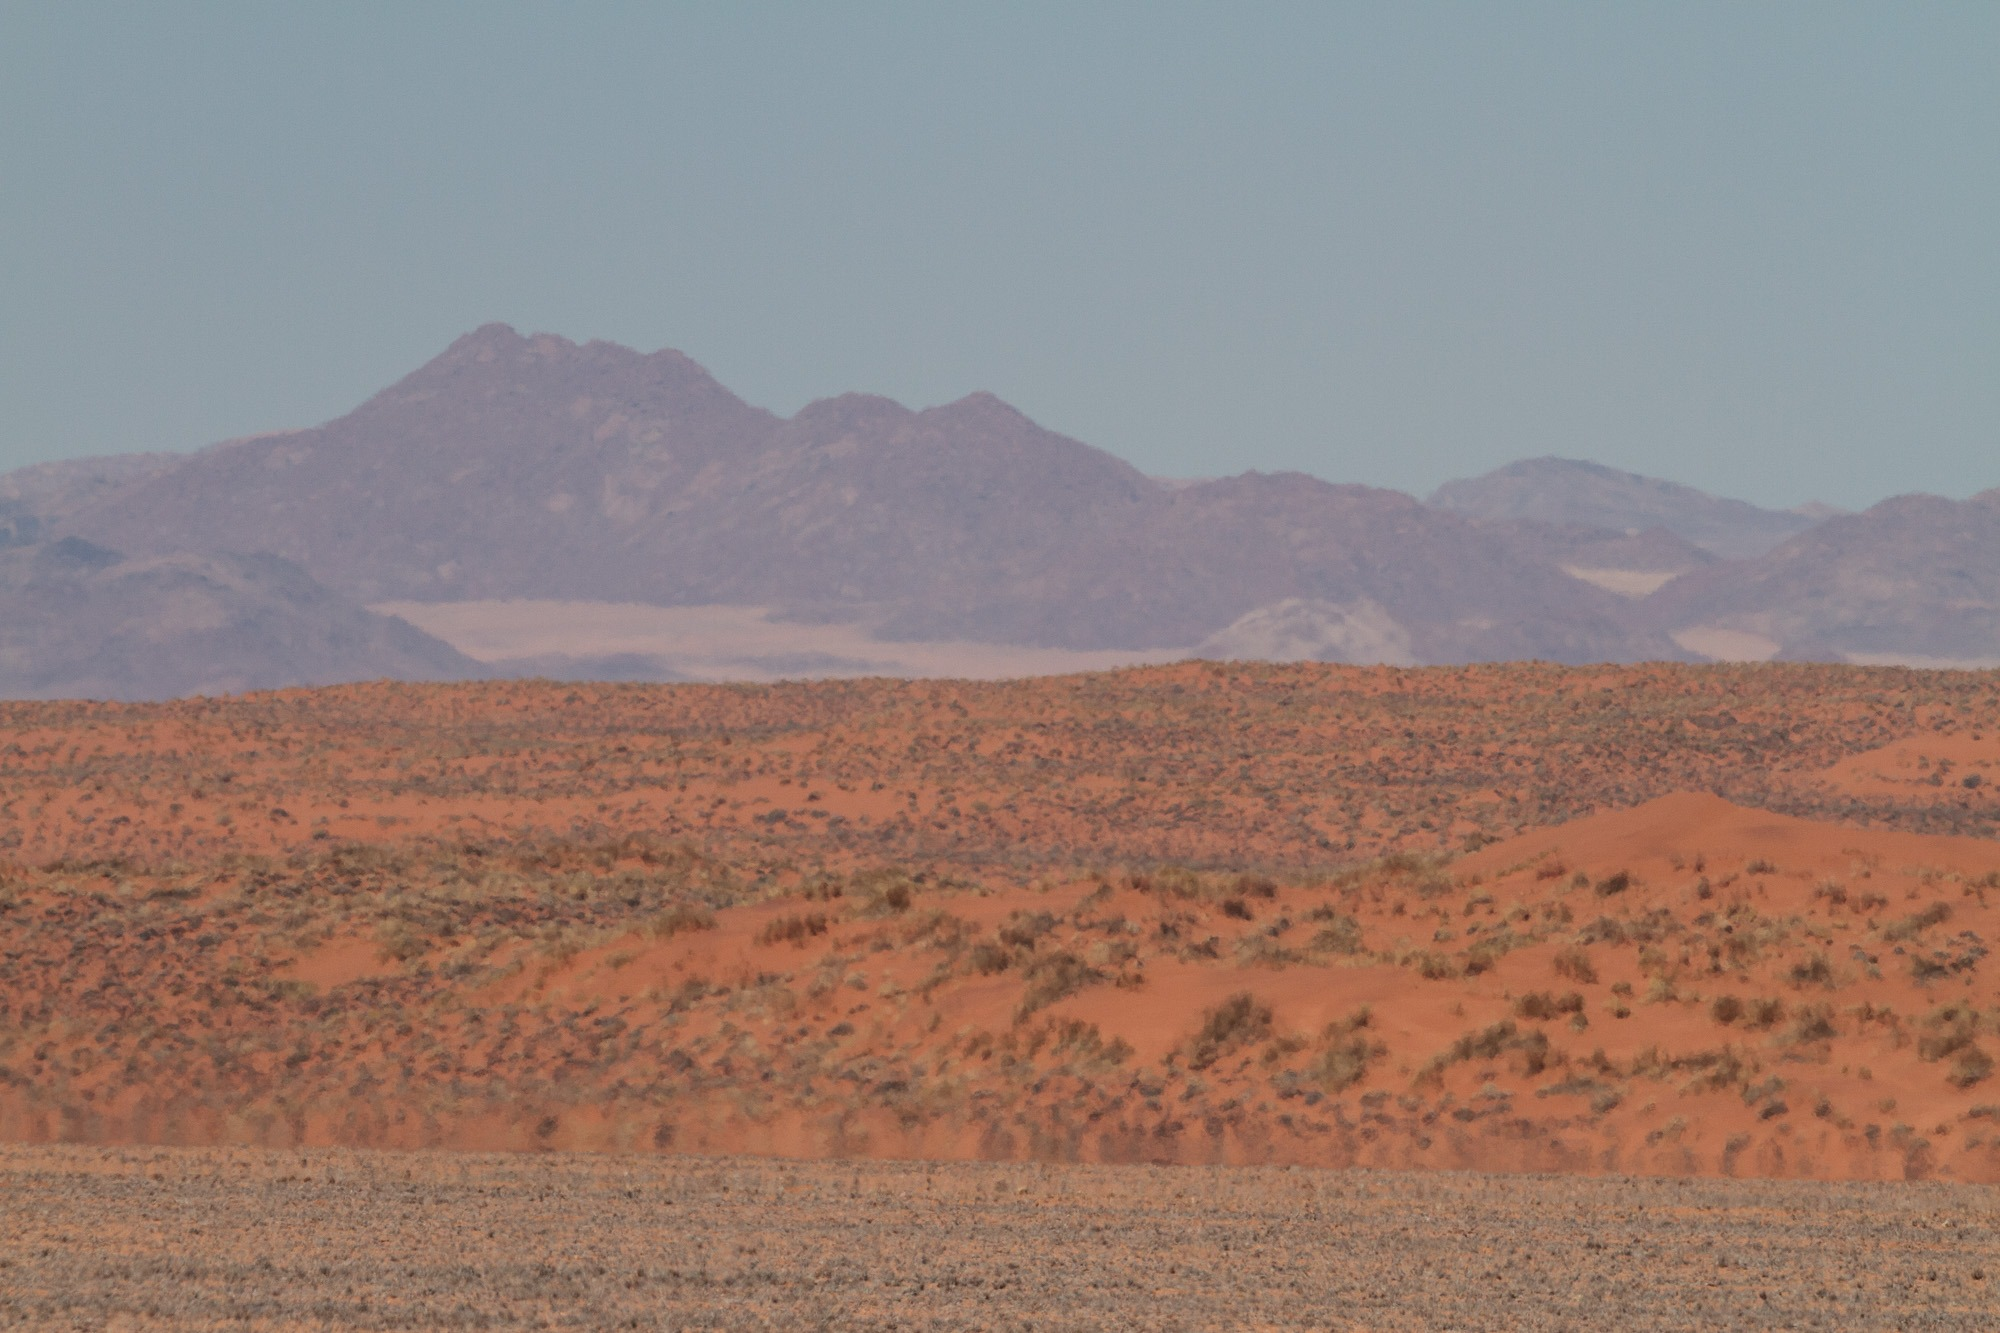 Namib Wüste und Tirasberge entlang der D707 in Namibia